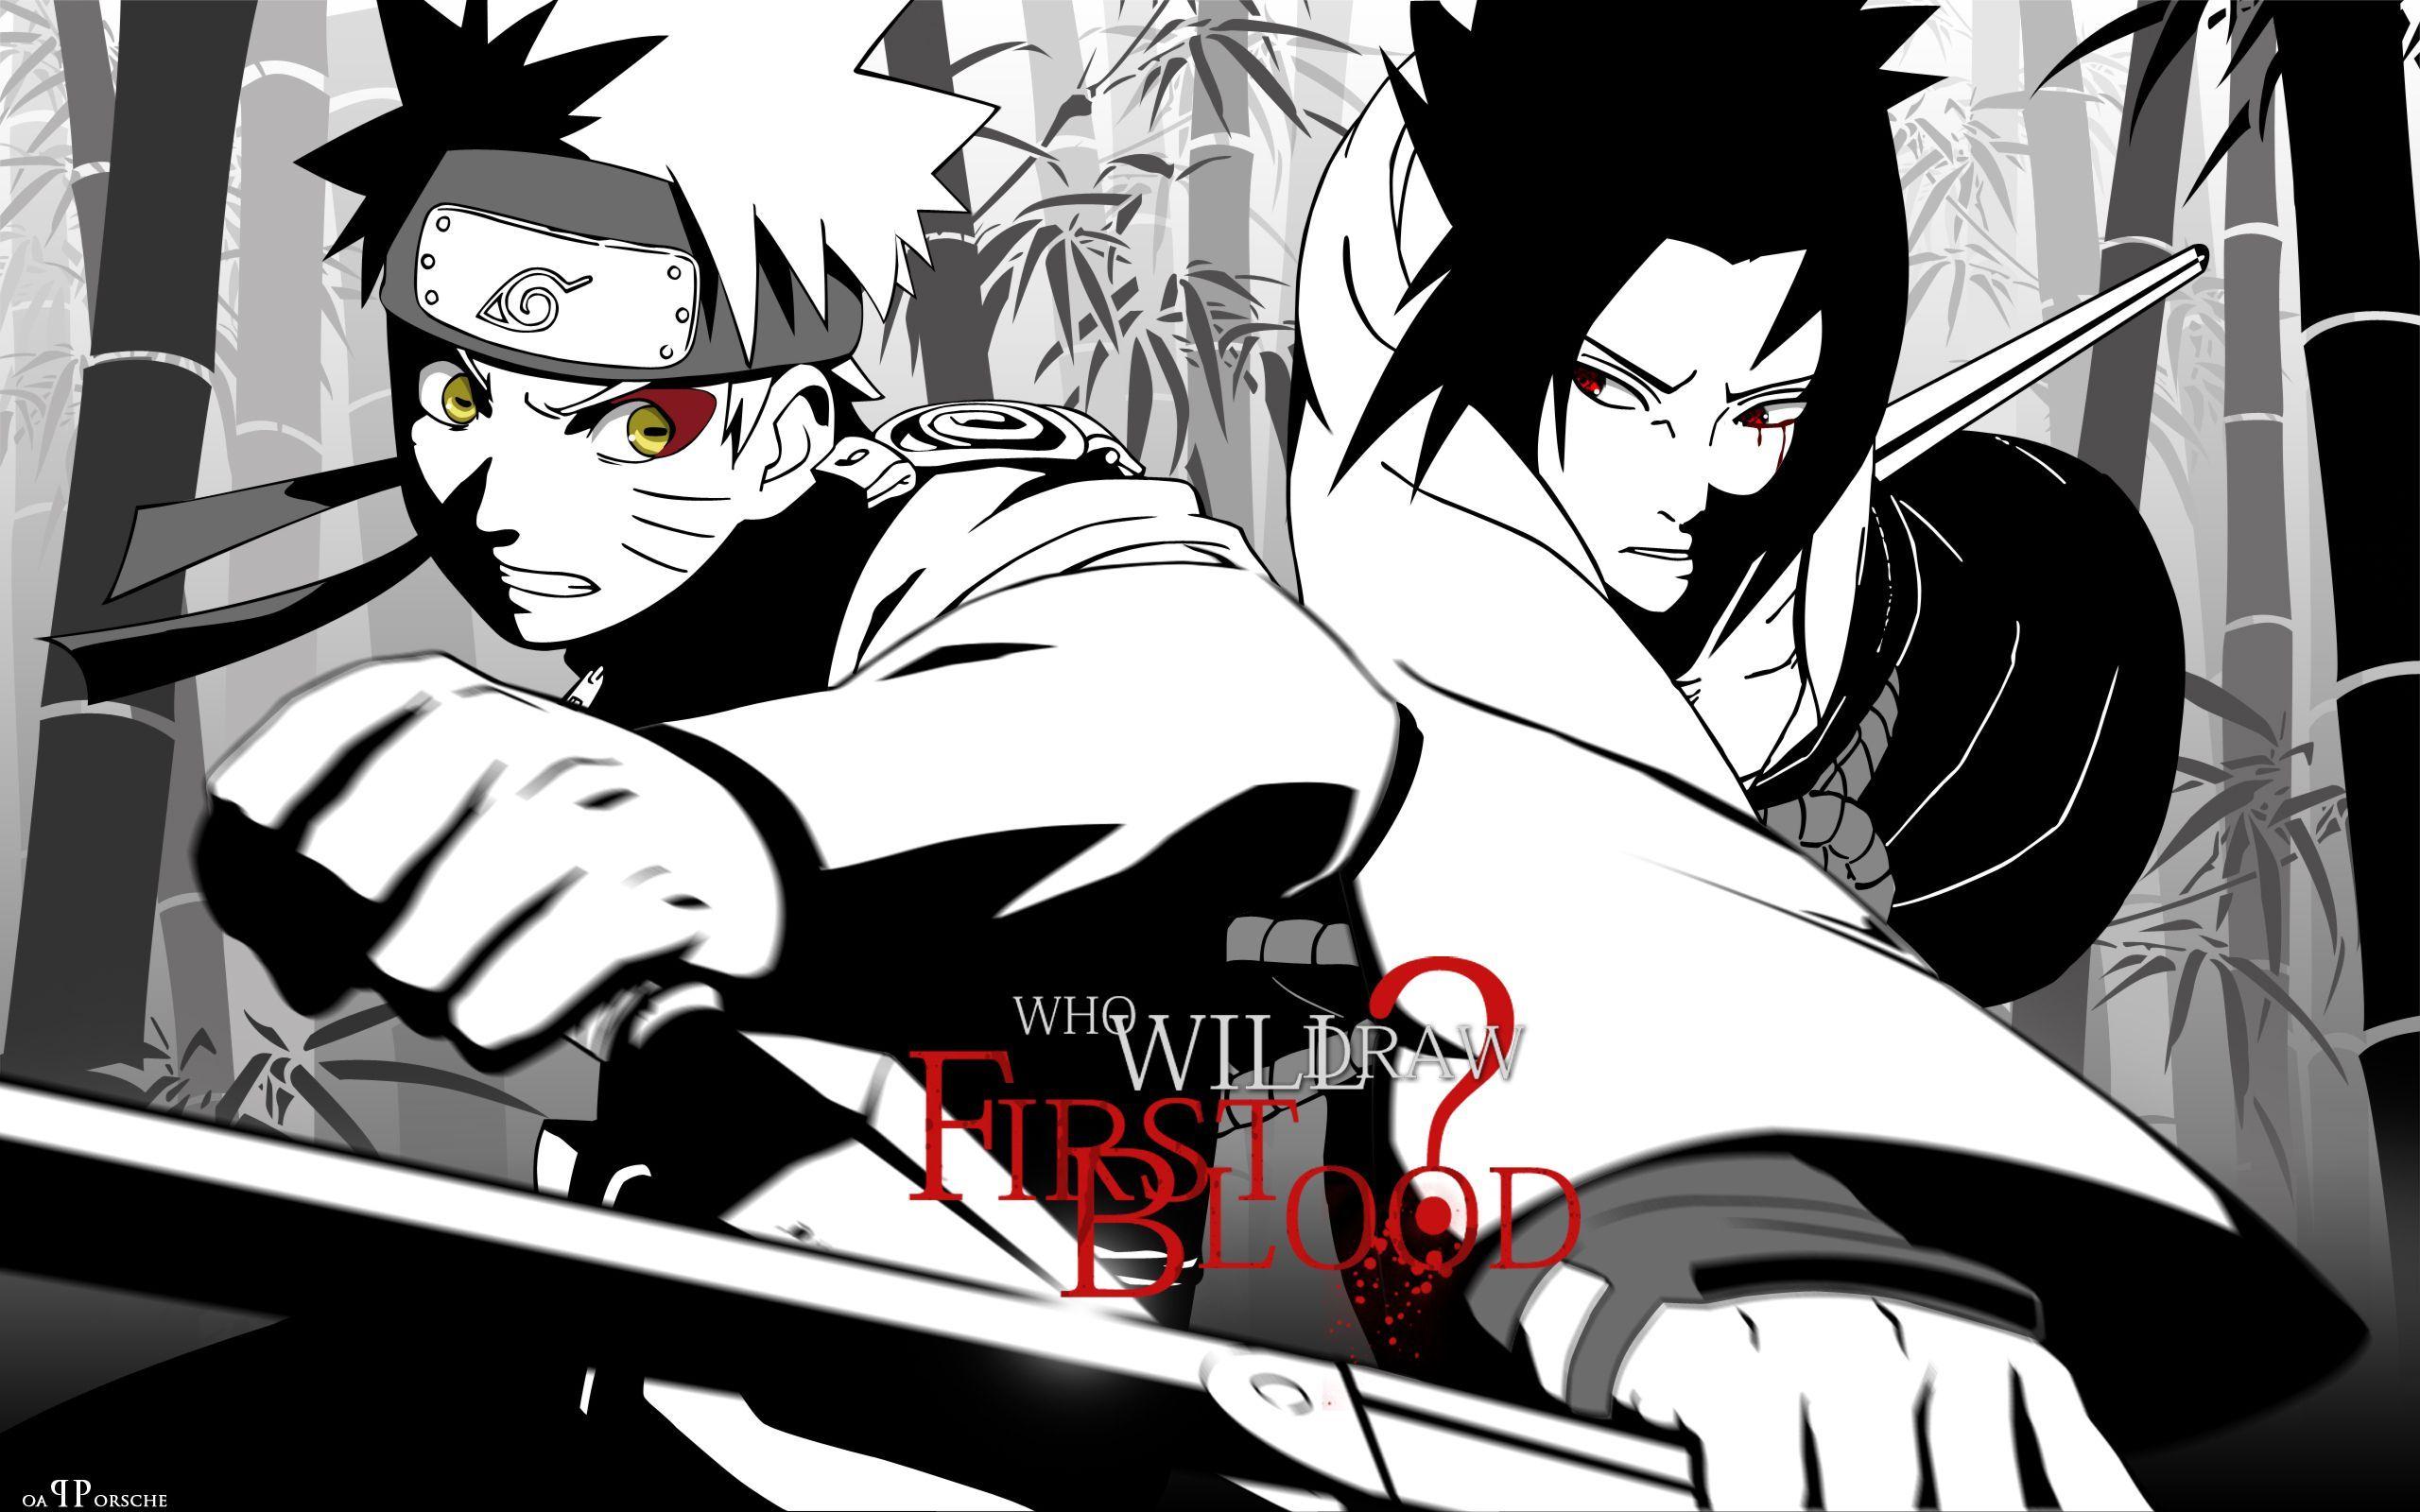 naruto vs sasuke wallpaper 009